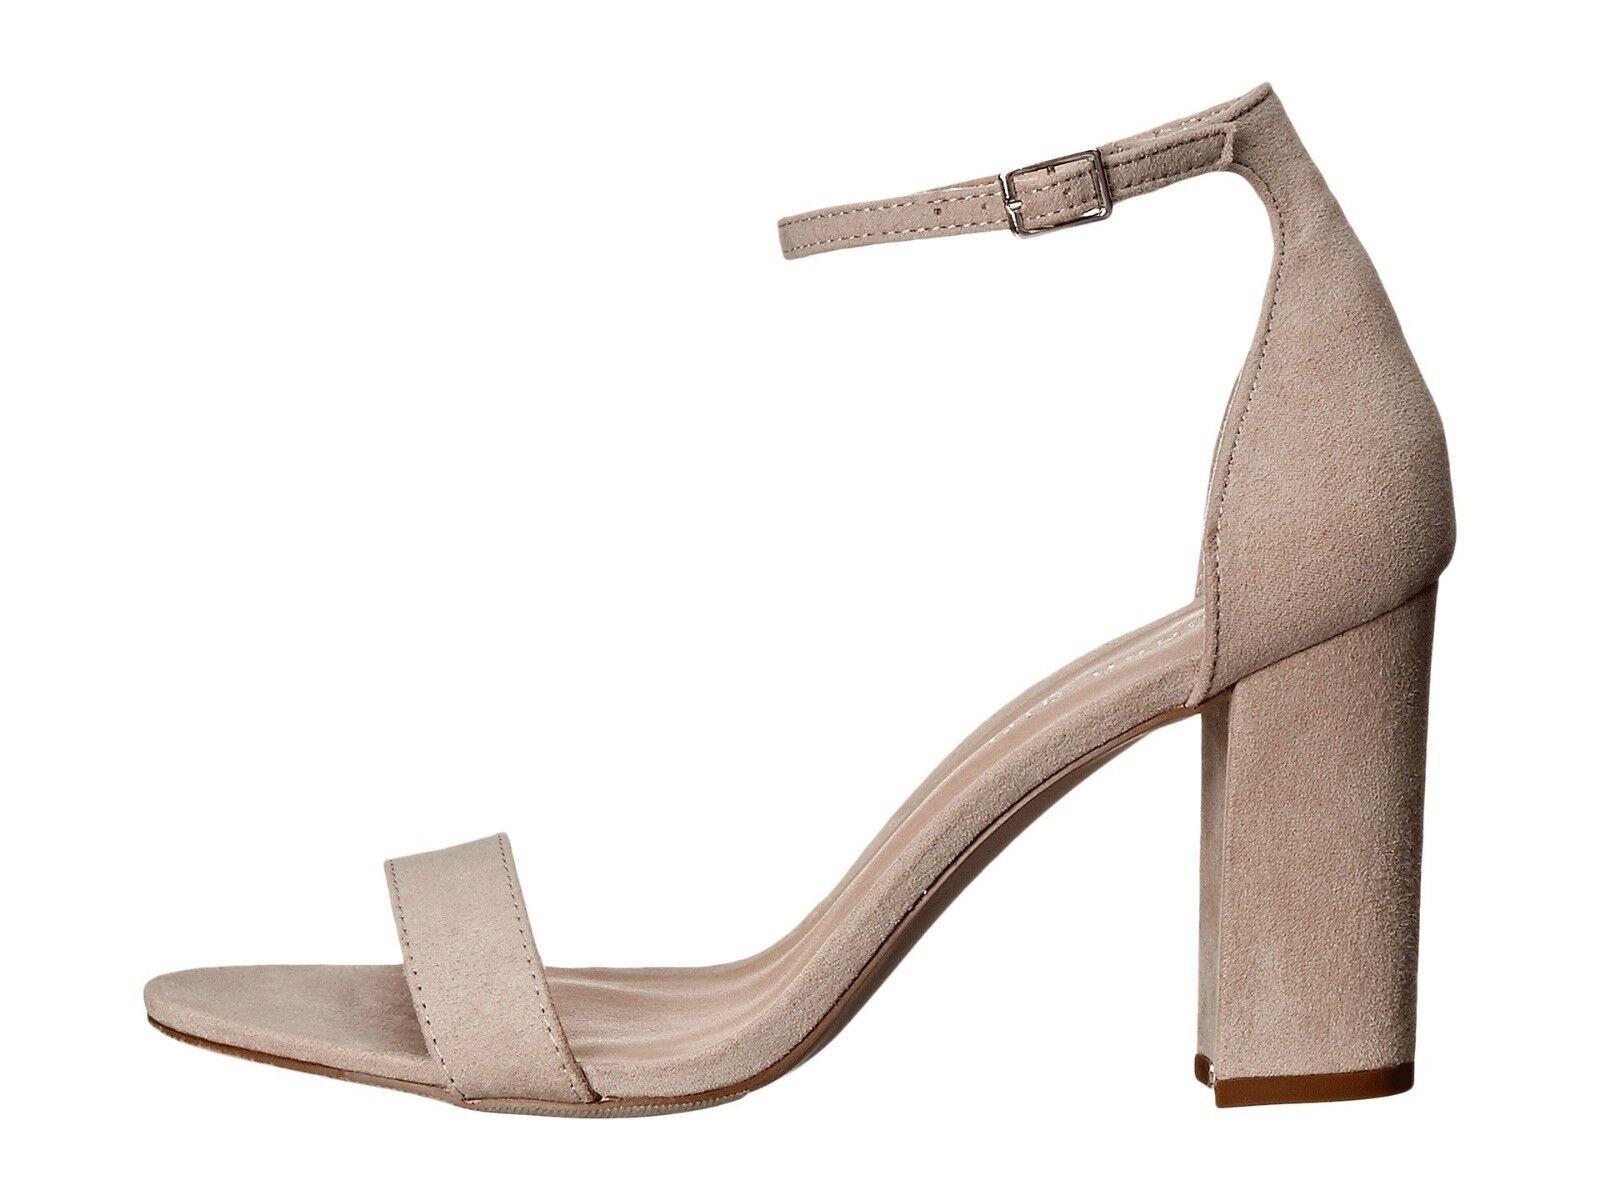 Madden Girl Beella Block Heel Sandals bleush Fabric Bridal Bridesmaid Taille 8.5